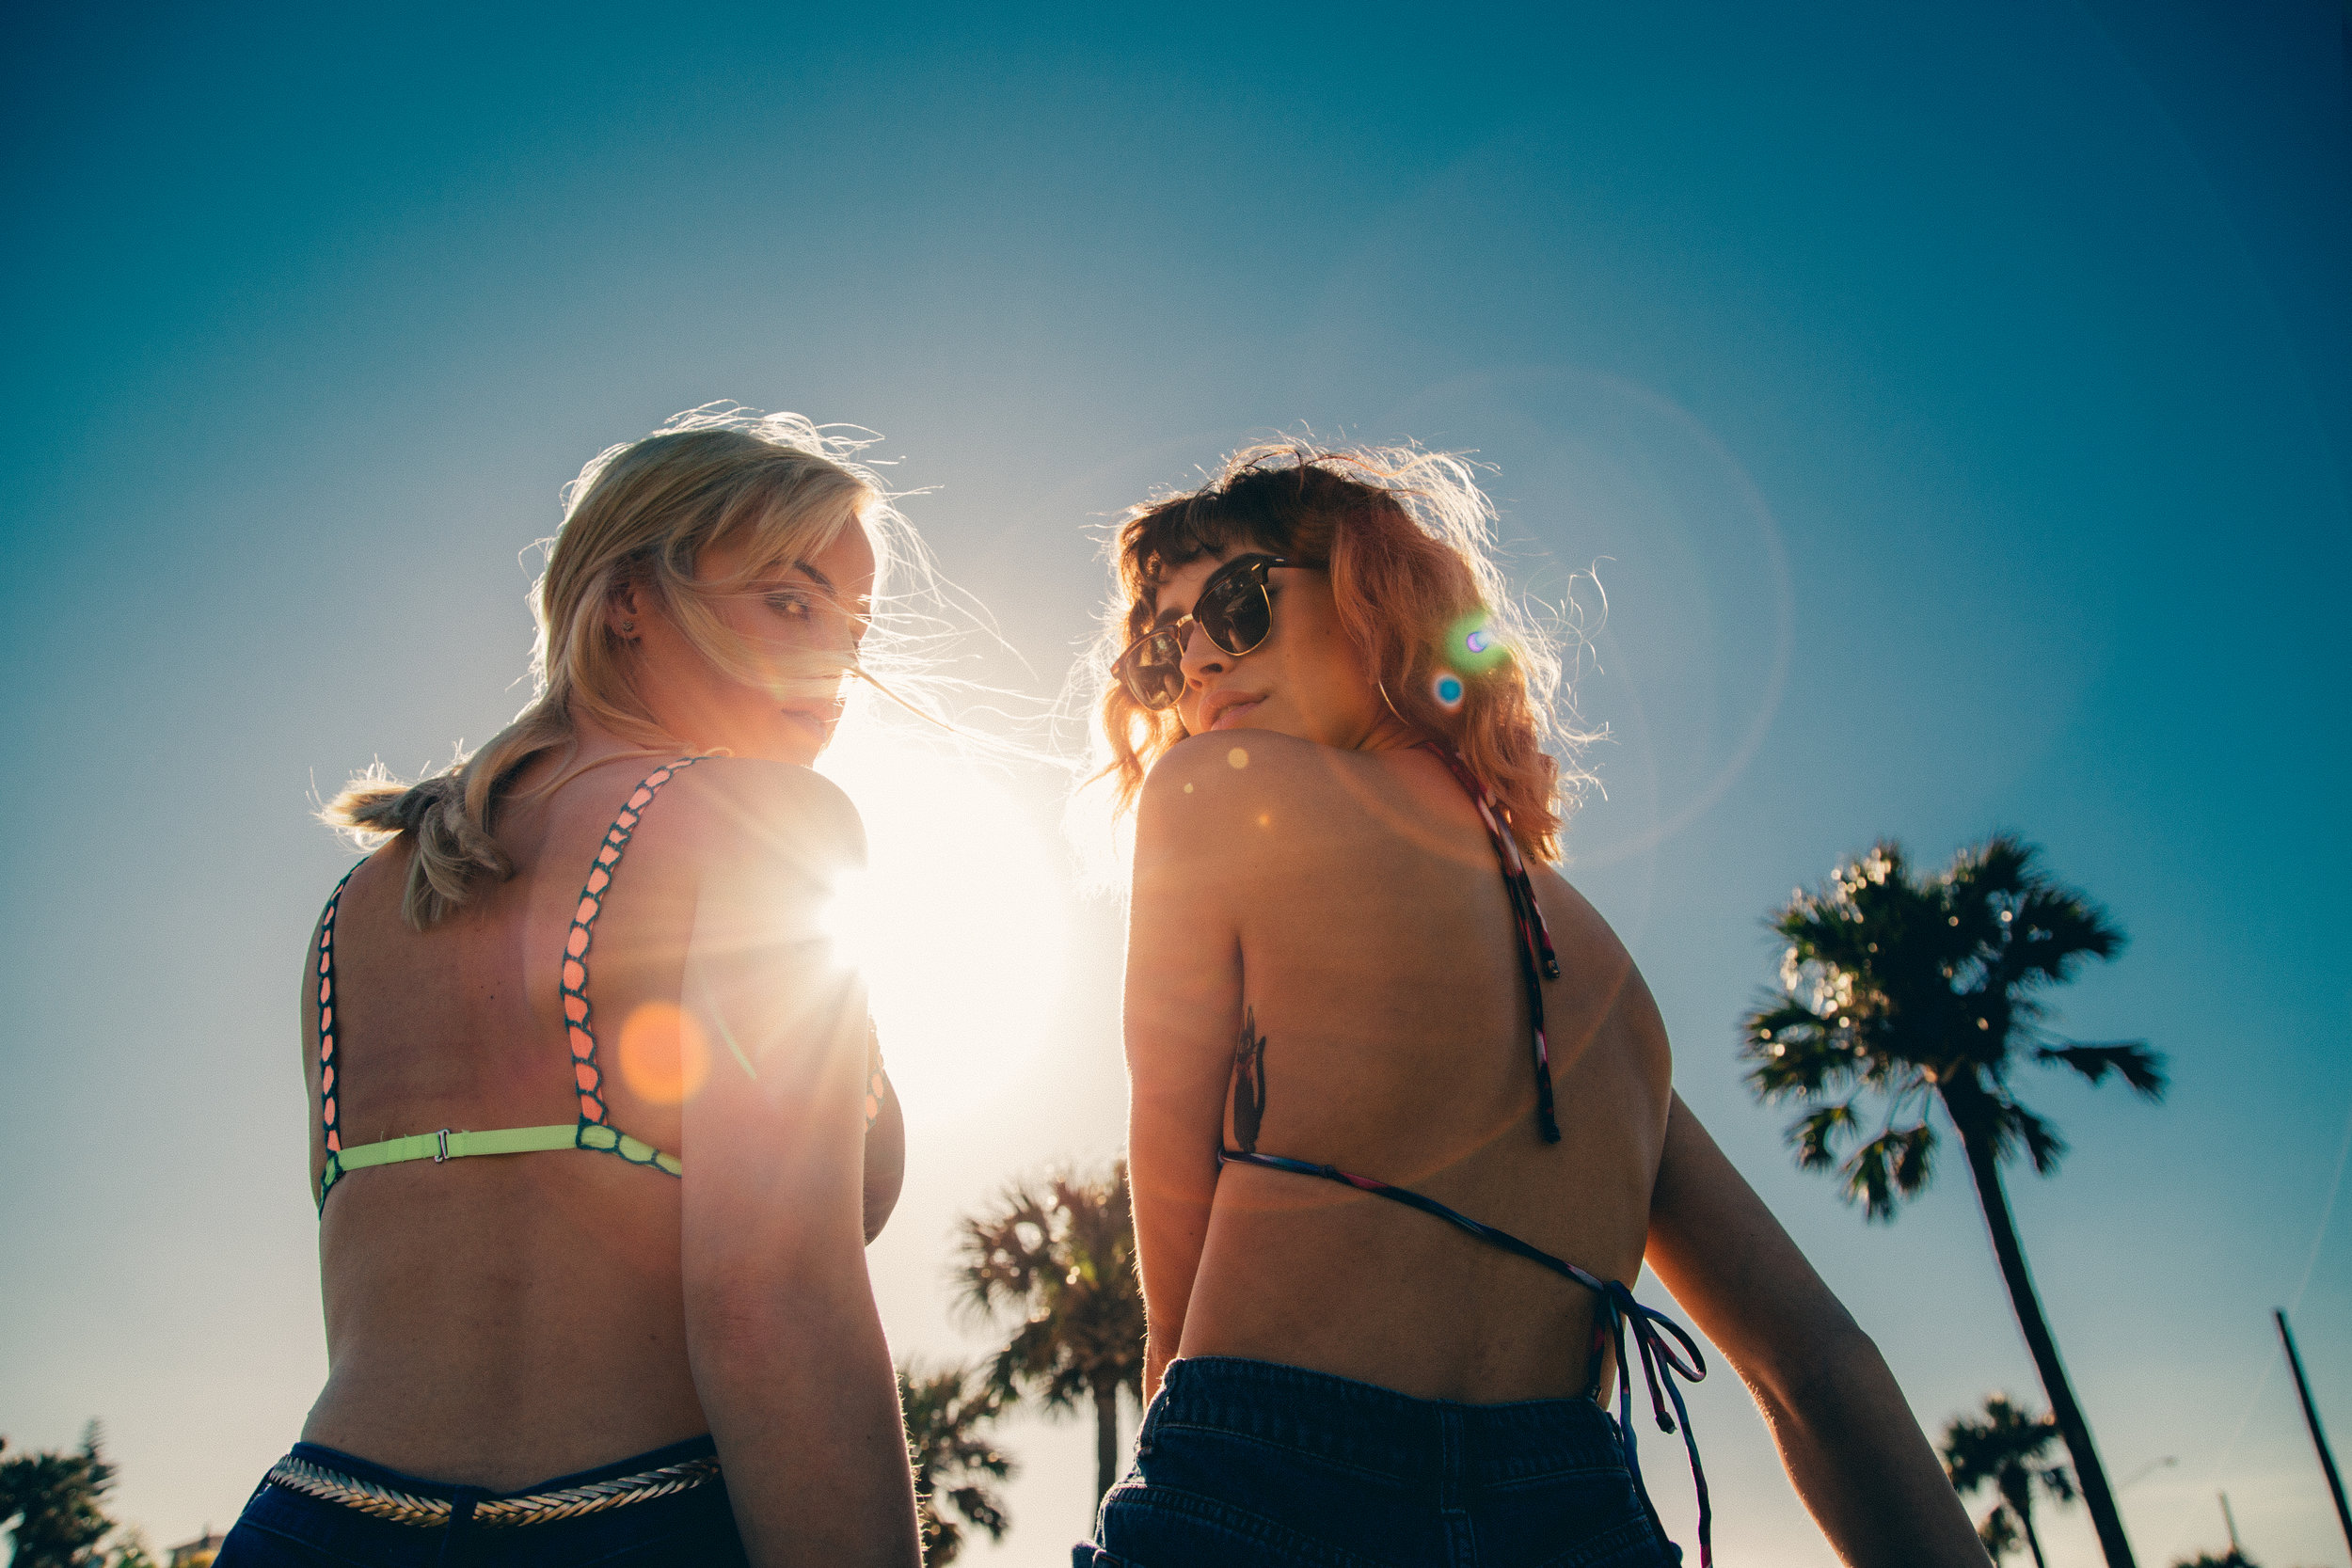 florida-portrait-photographer-lifestyle-sunset